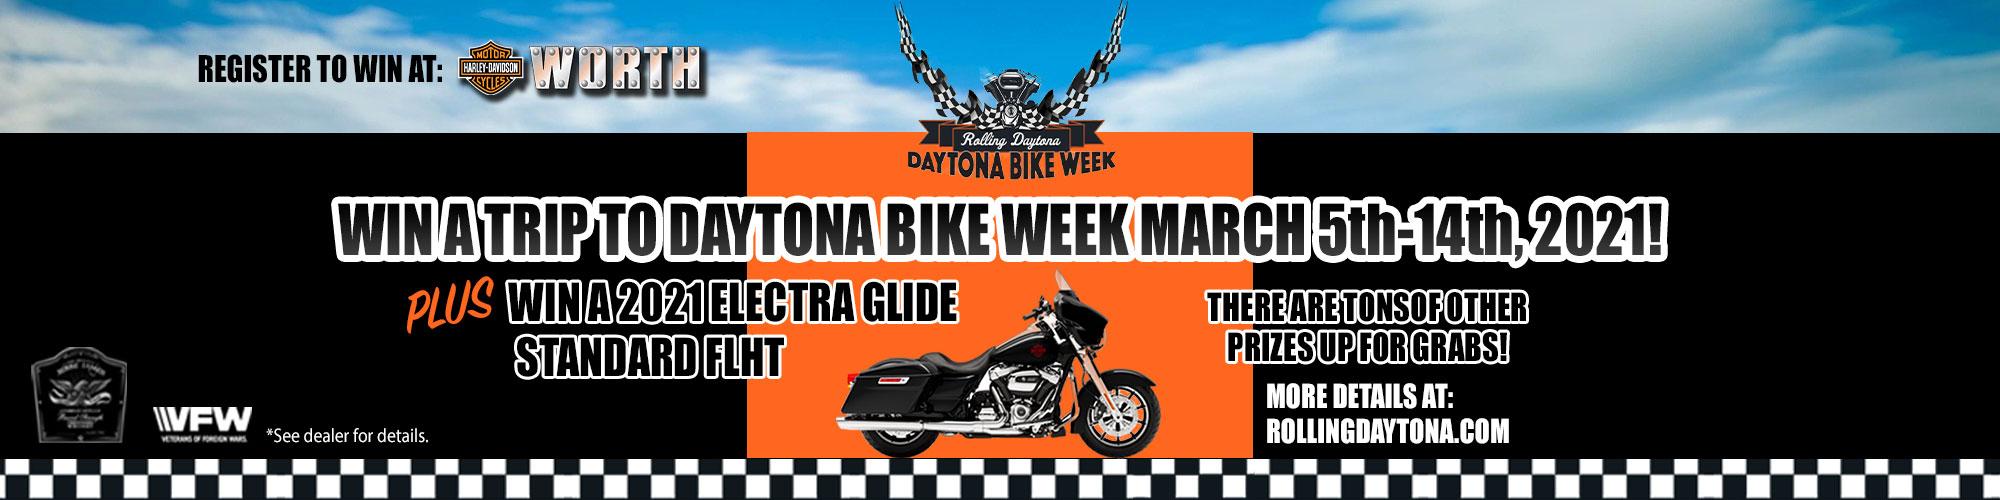 Harley Rolling Daytona - Harley Bike Week Contest